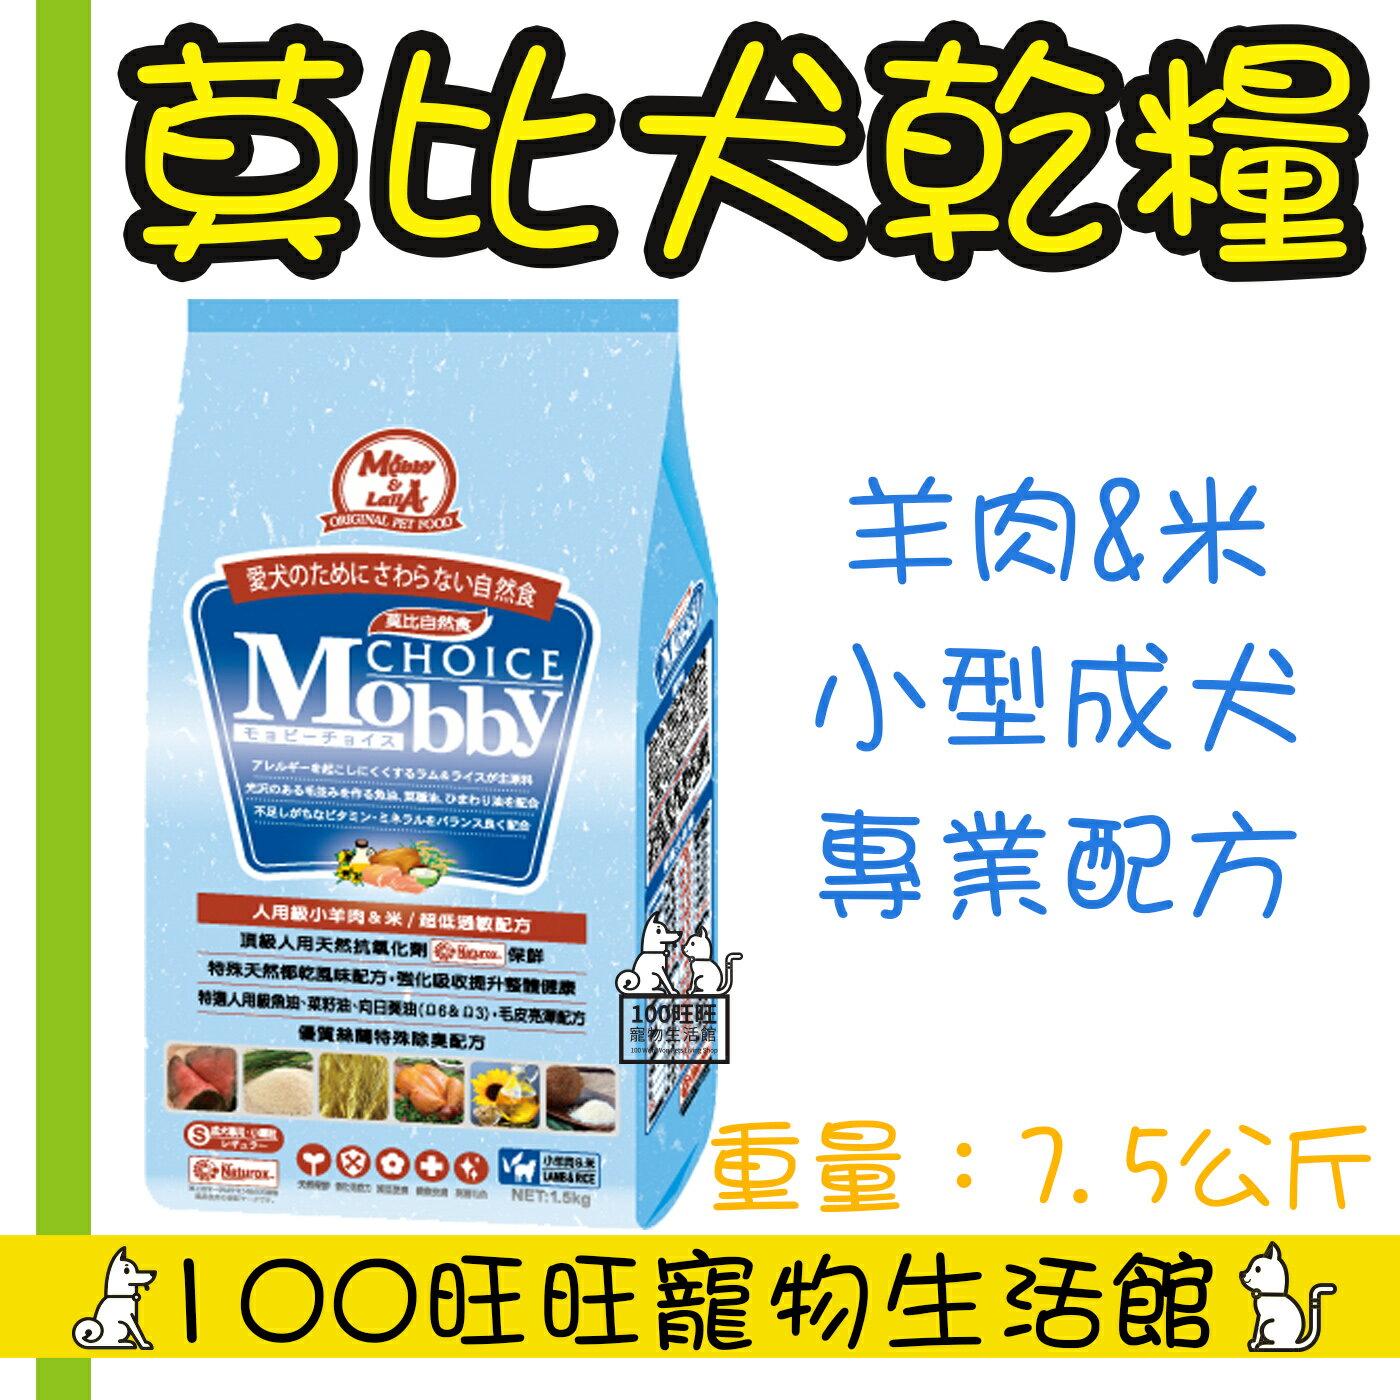 Mobby 莫比 羊肉米 小型成犬 7.5kg 0